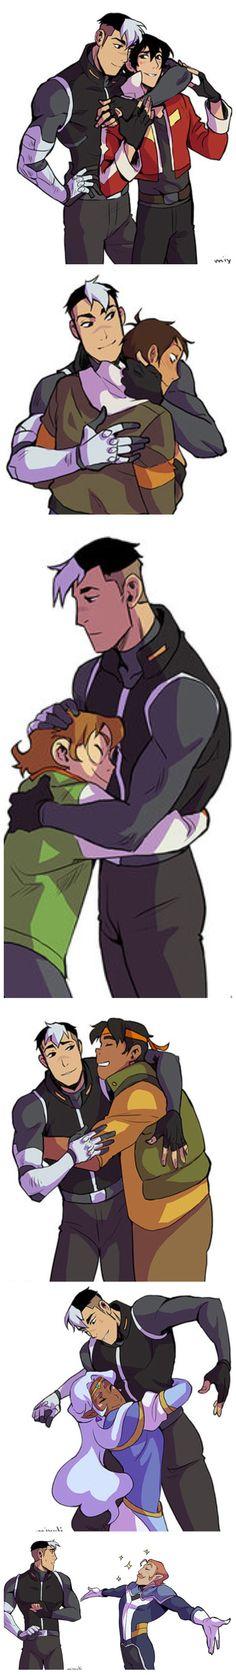 Hug Coran dammit